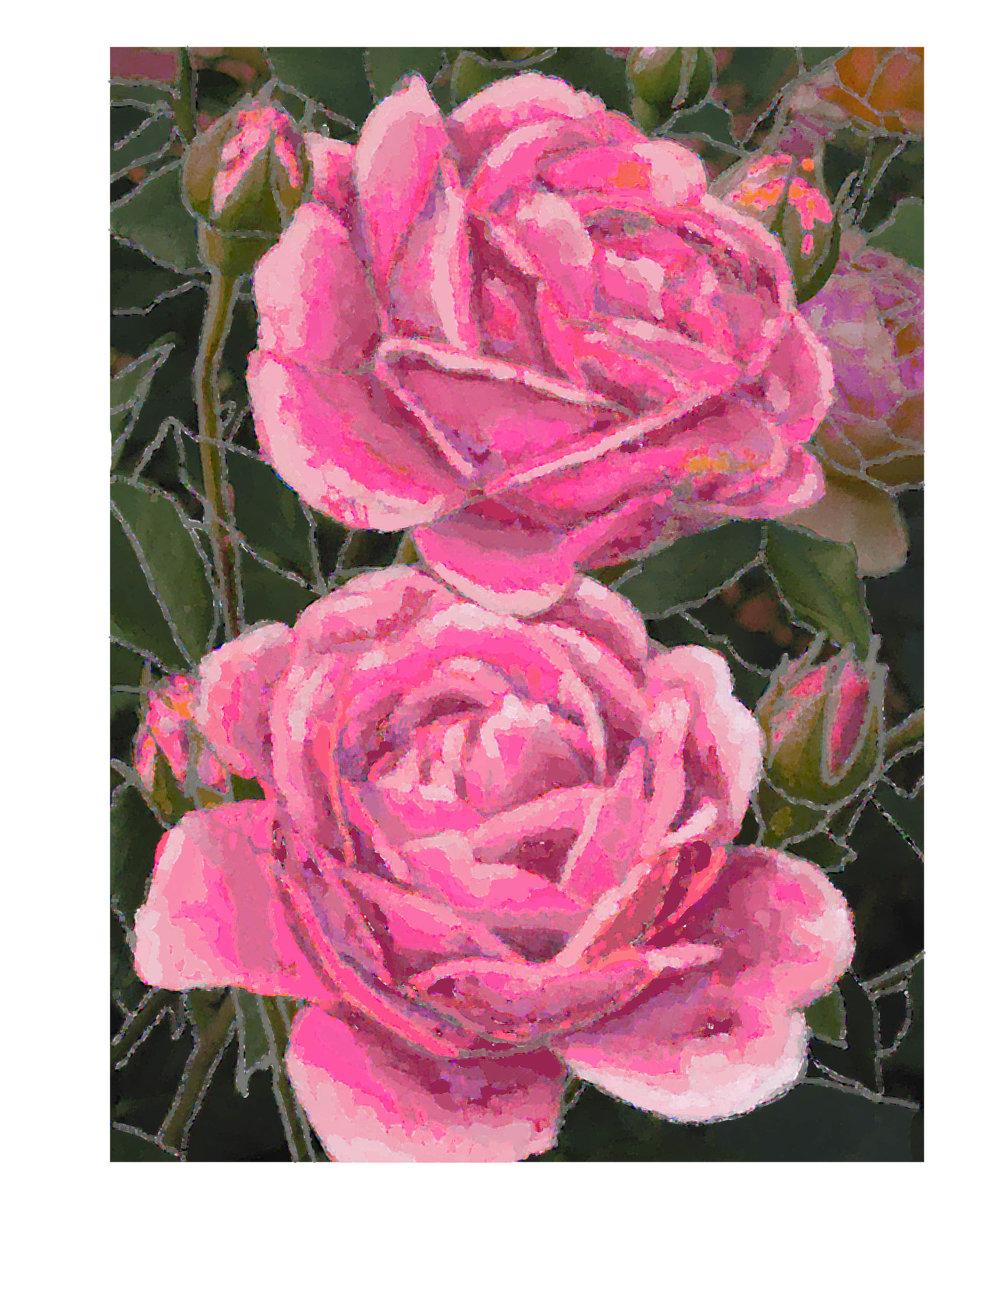 hot pink roses buds rug.jpg